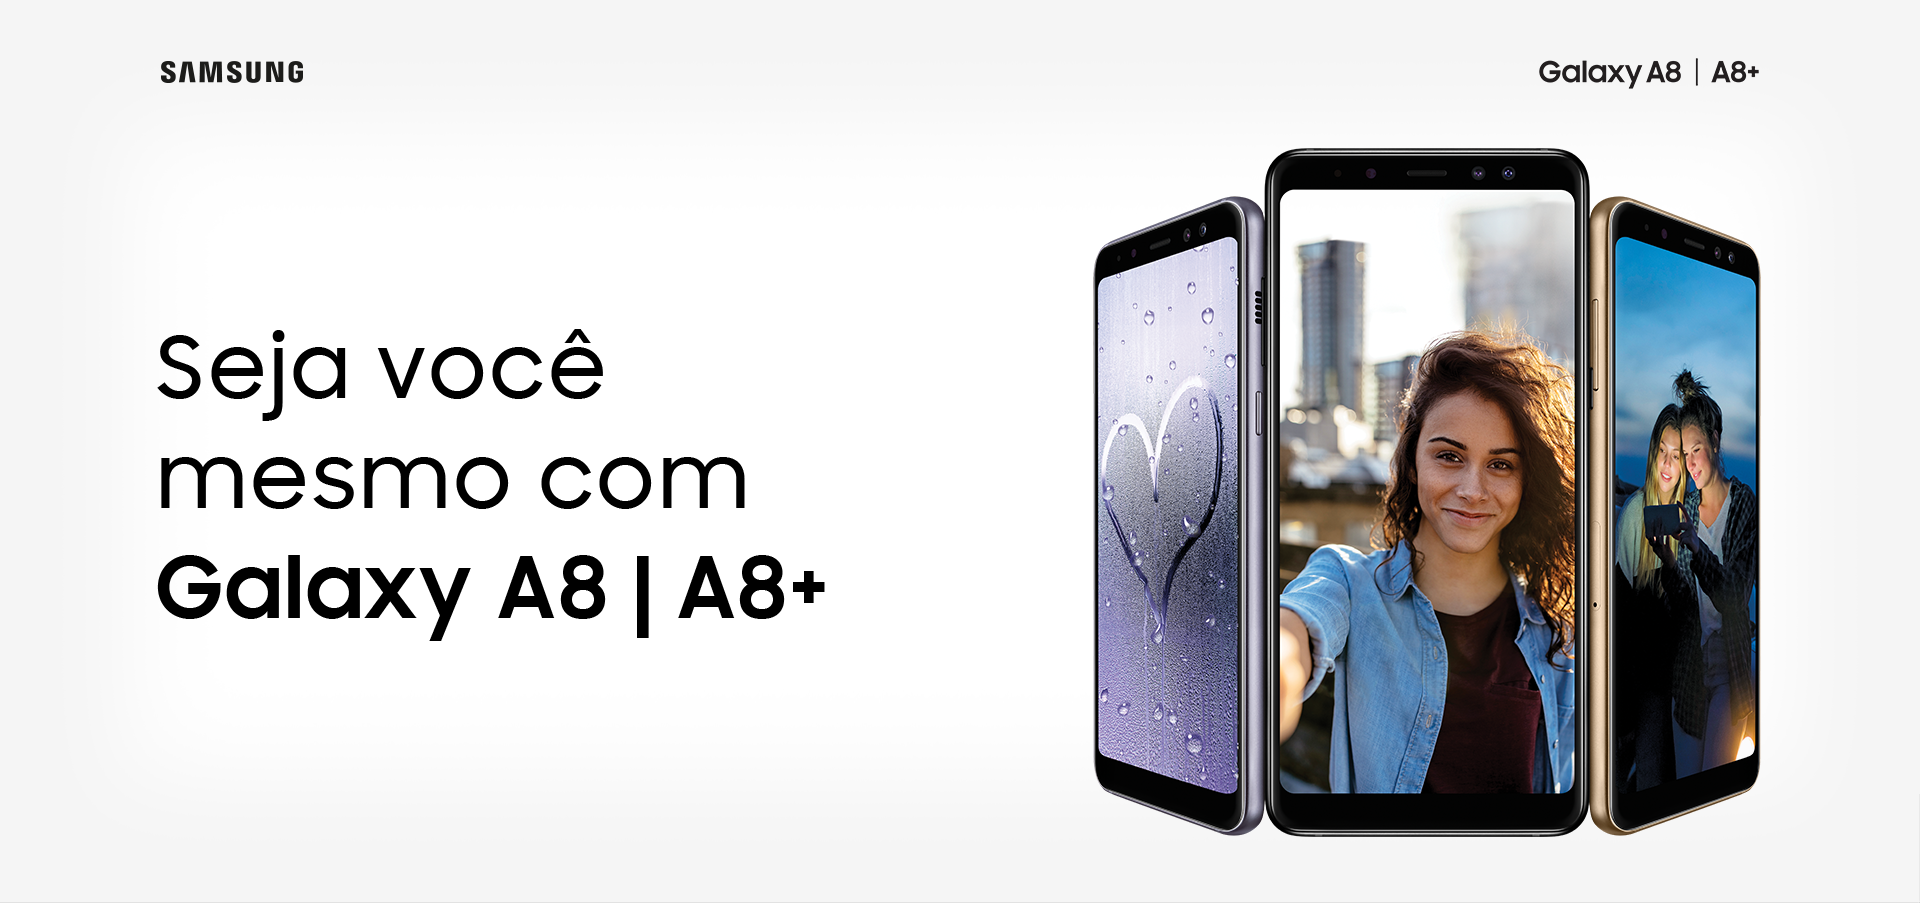 Samsung Galaxy A8 | A8+